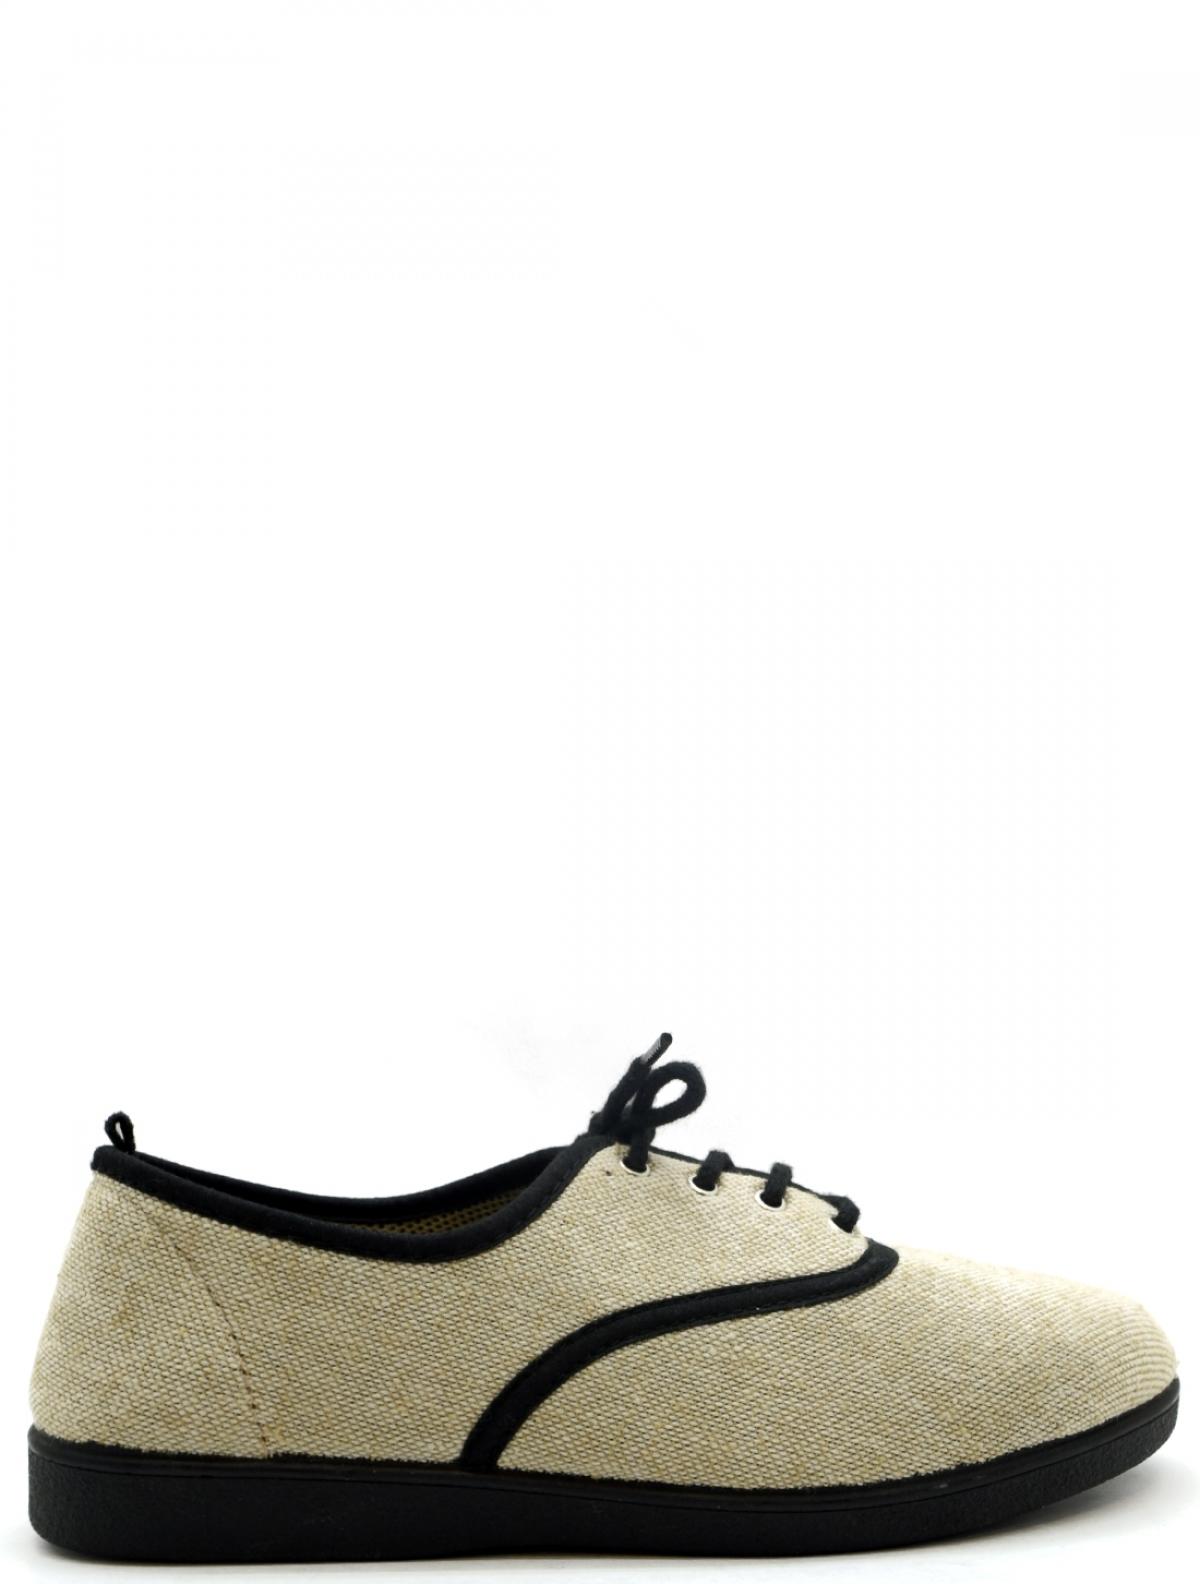 Imara Moda 196-20410-400 женские туфли